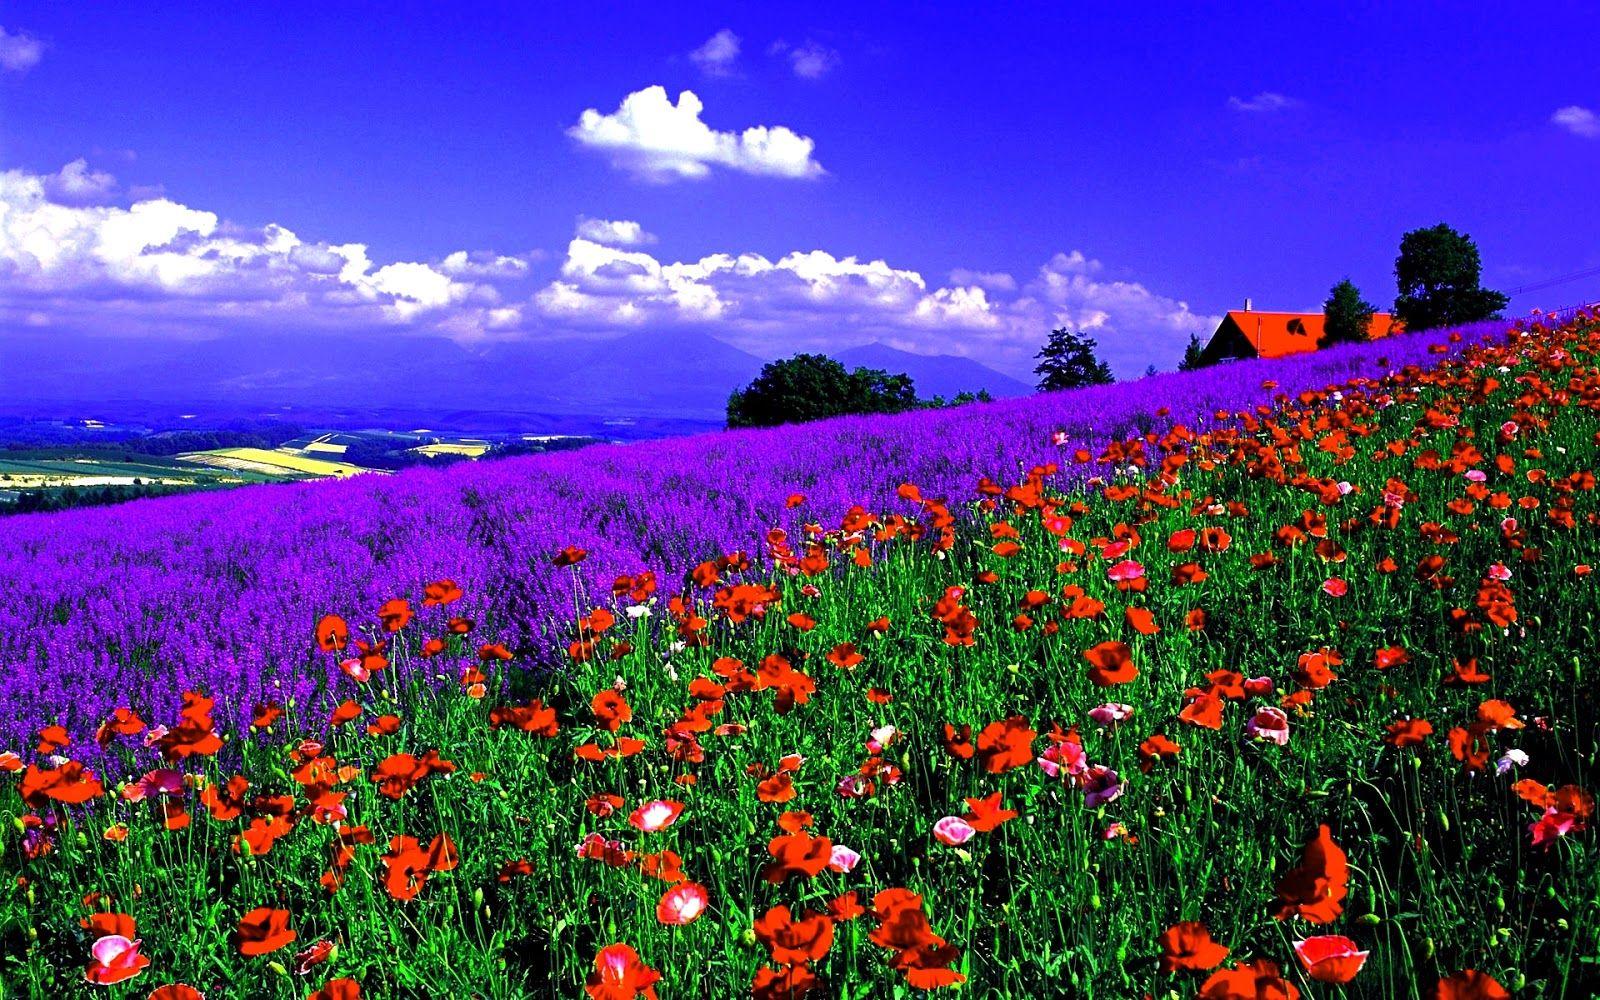 Paisajes de flores de flores flores de colores - Fotos de flores bonitas ...